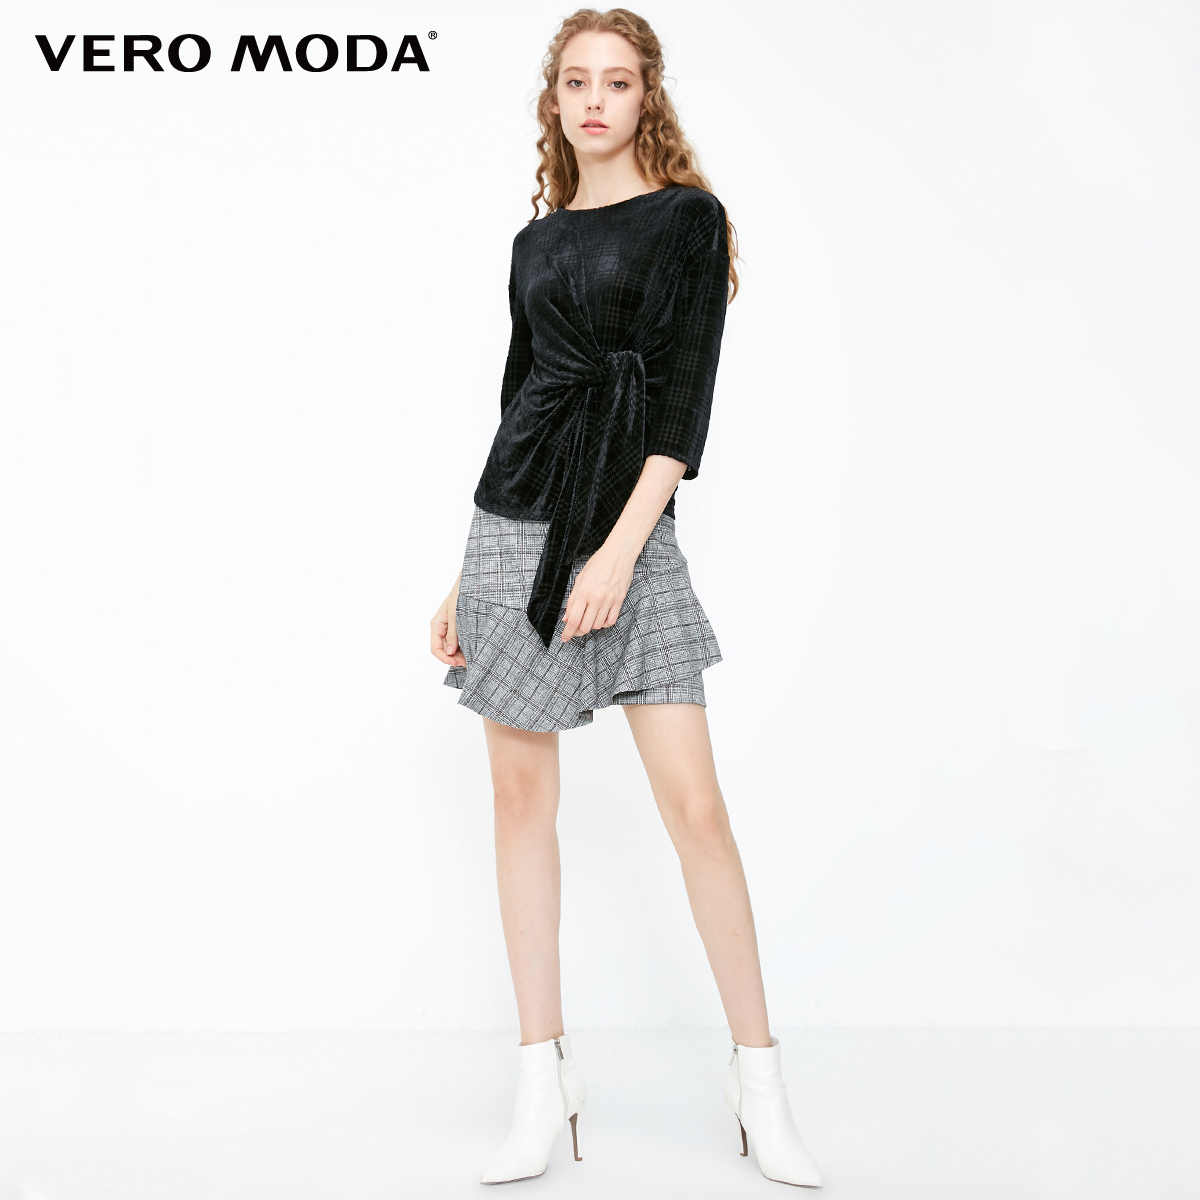 Vero Moda נשים סתיו Slim Fit סביב צוואר רצועת 3/4 שרוול חולצה | 318330505